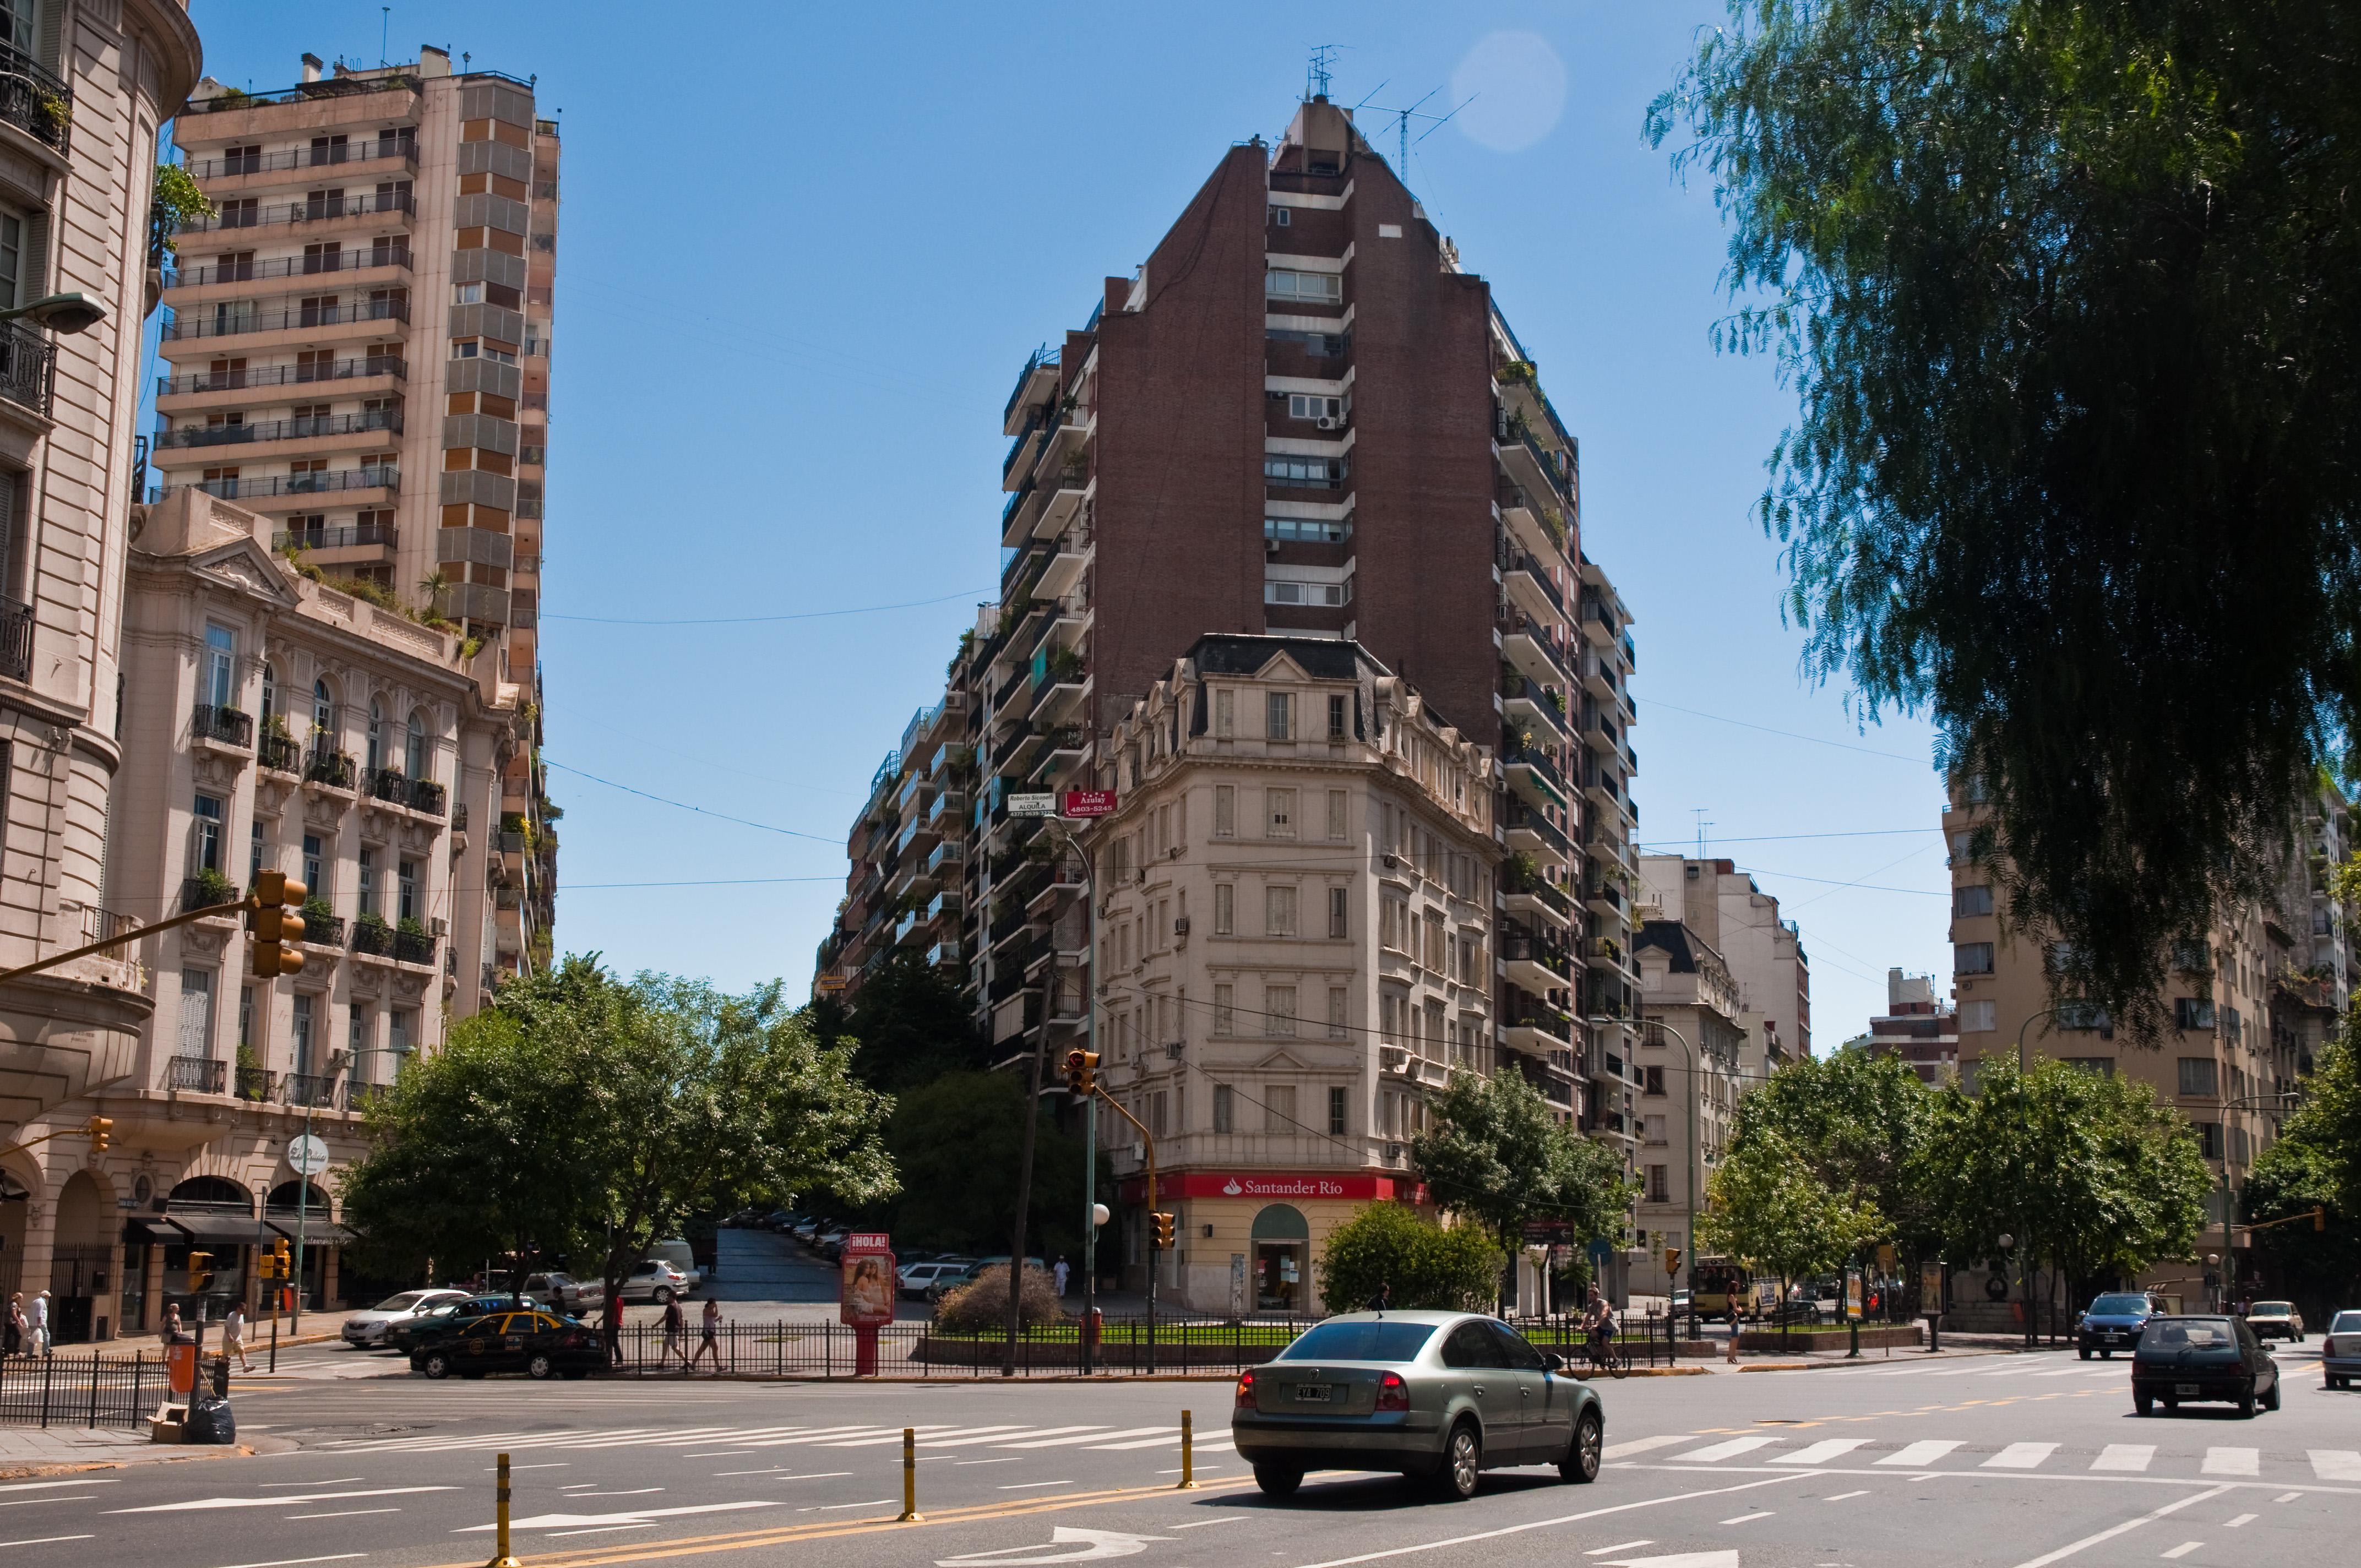 hastighet dating Buenos Aires Argentina Hvordan Sci Fi hastighet dating arbeid